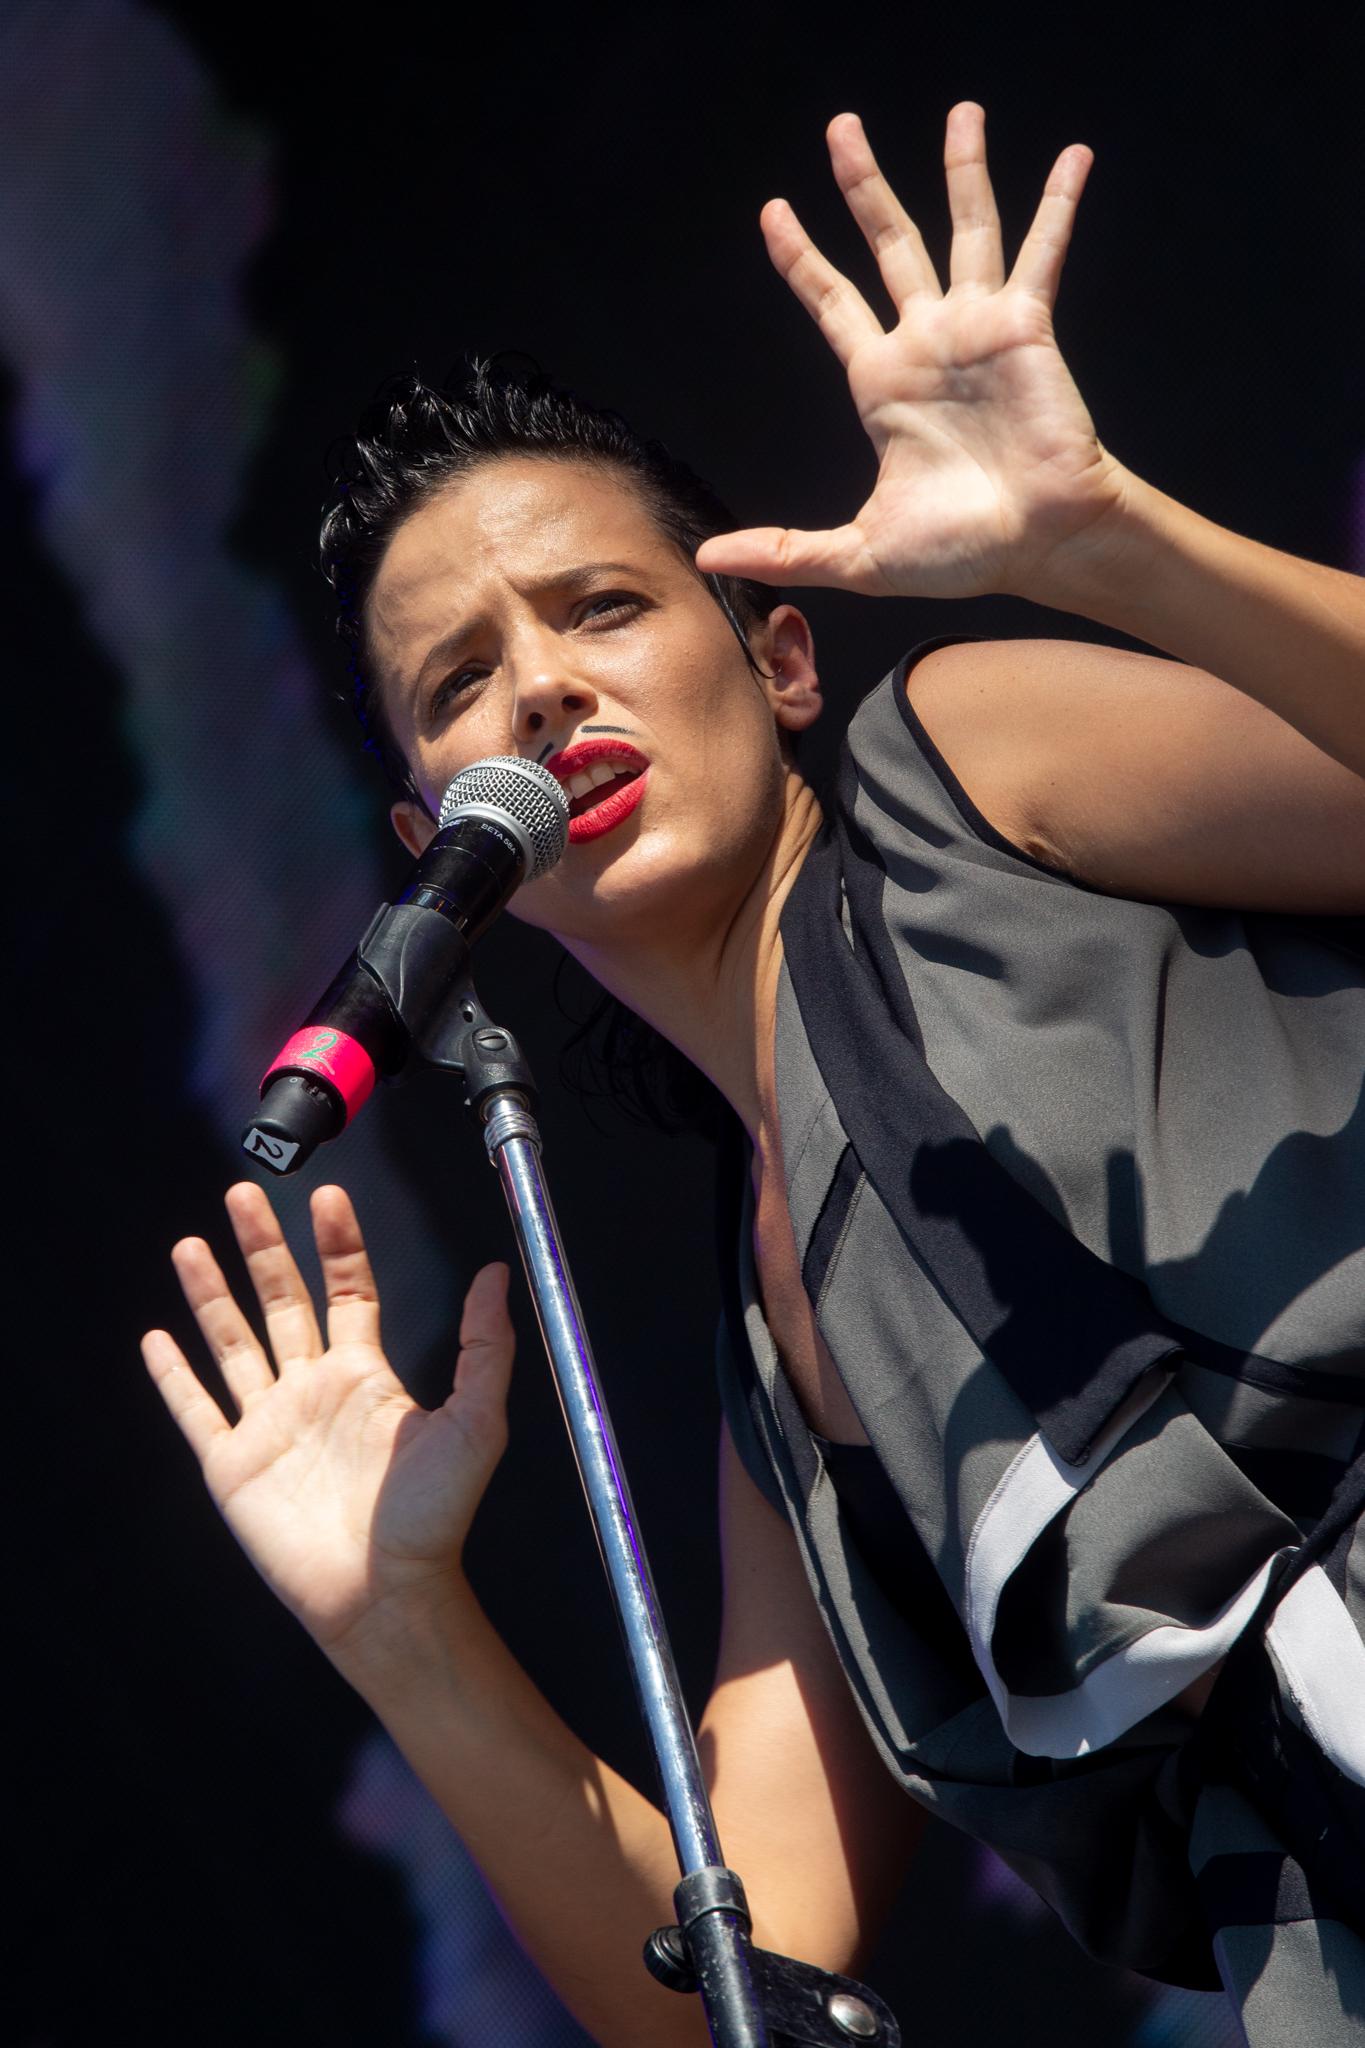 Perotá Chingó en el Lollapalooza 2019 (Foto: Lollapalooza)